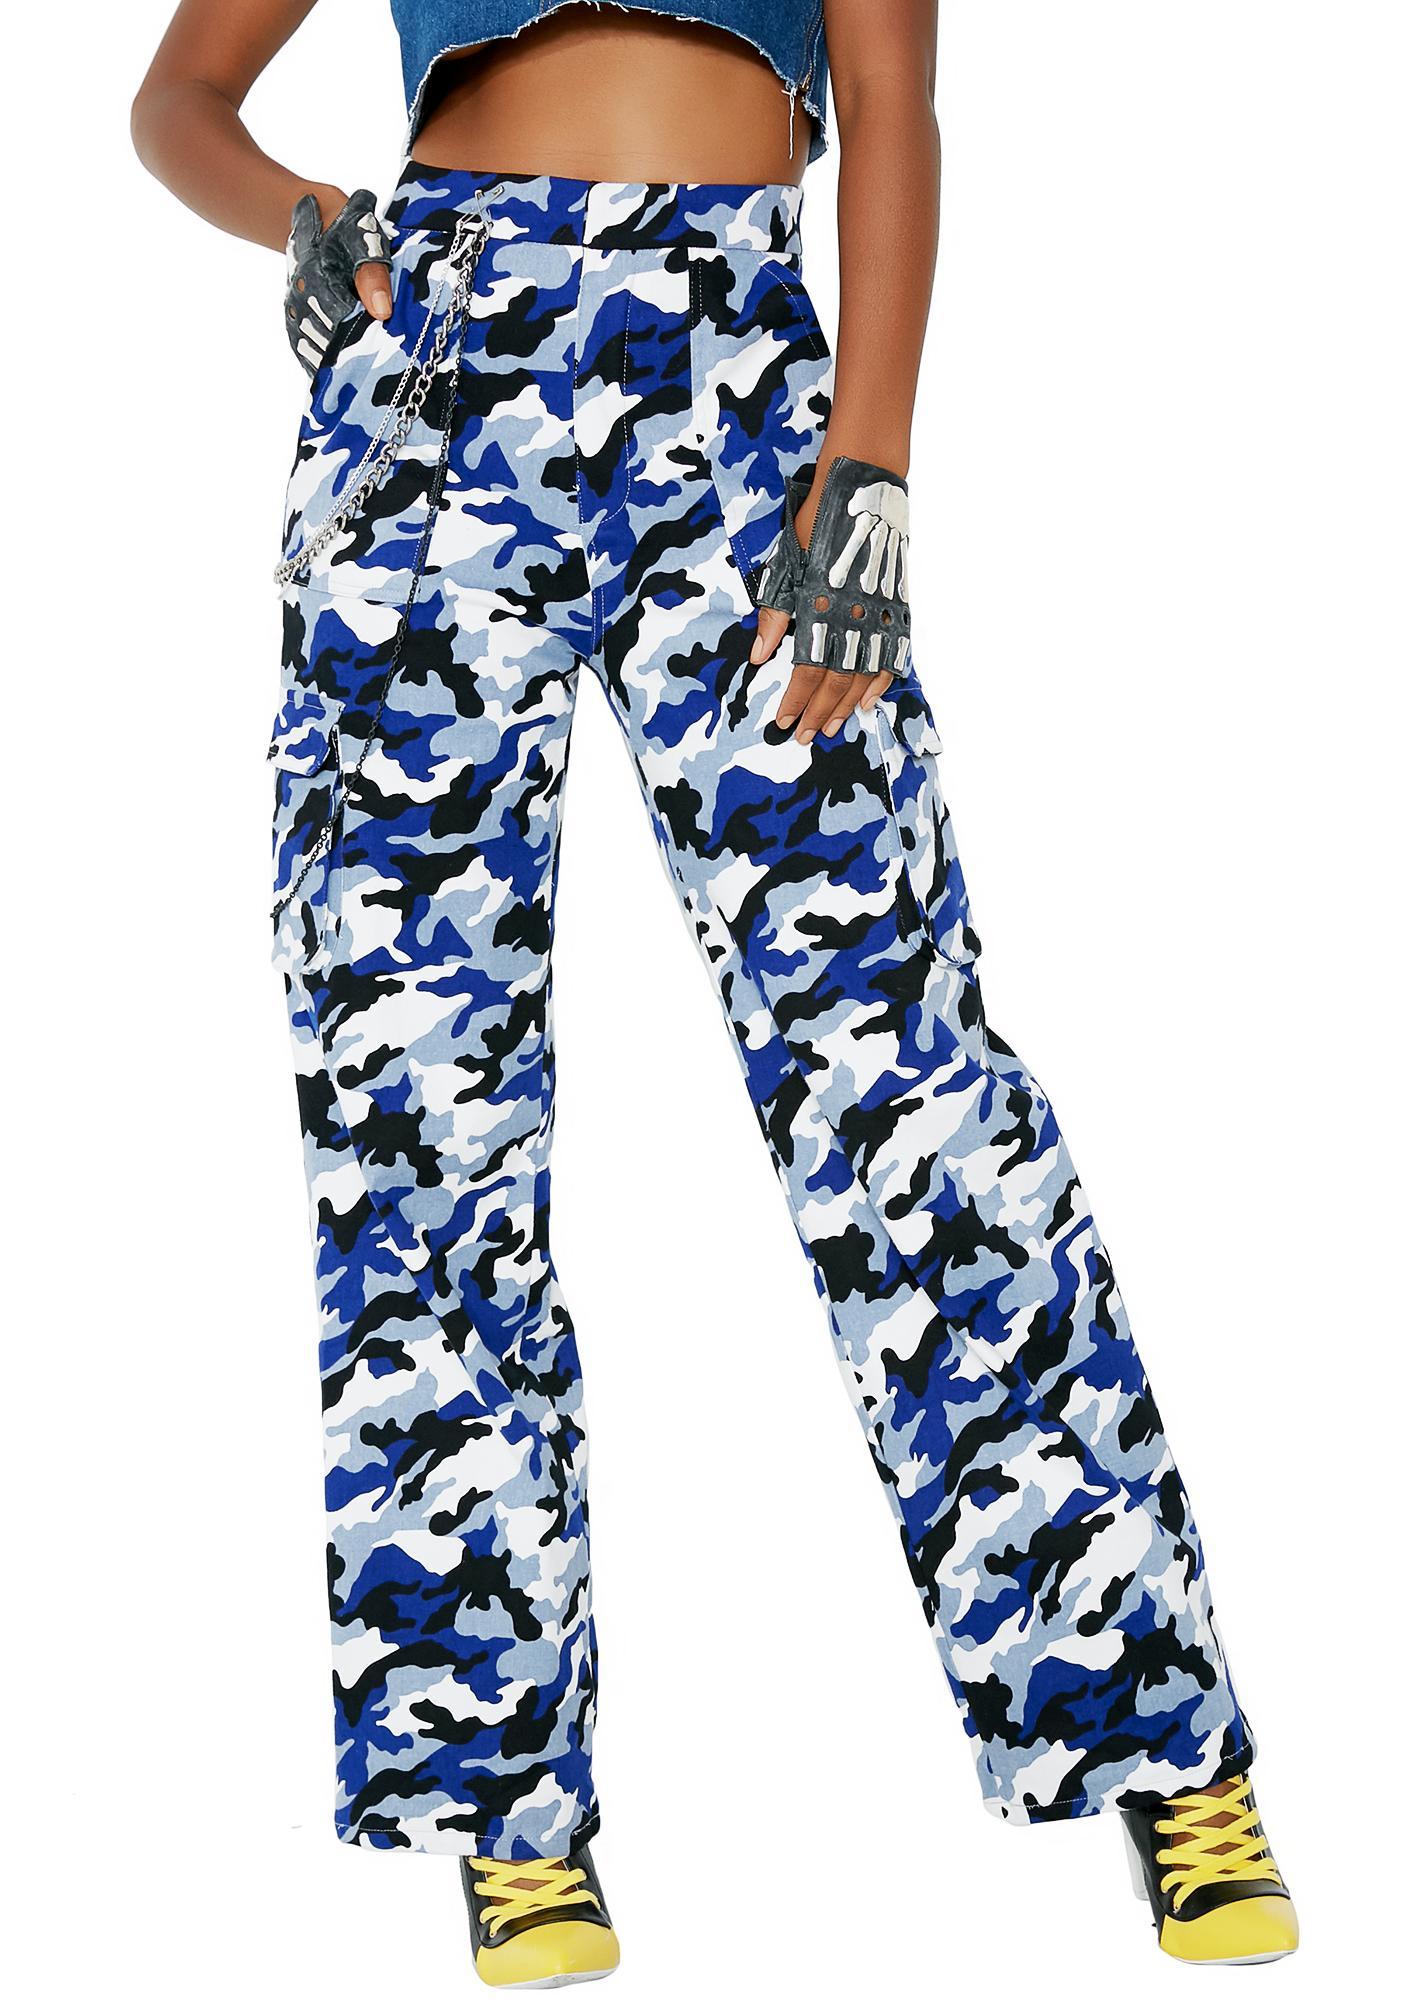 I AM GIA Royal Tarantino Pants